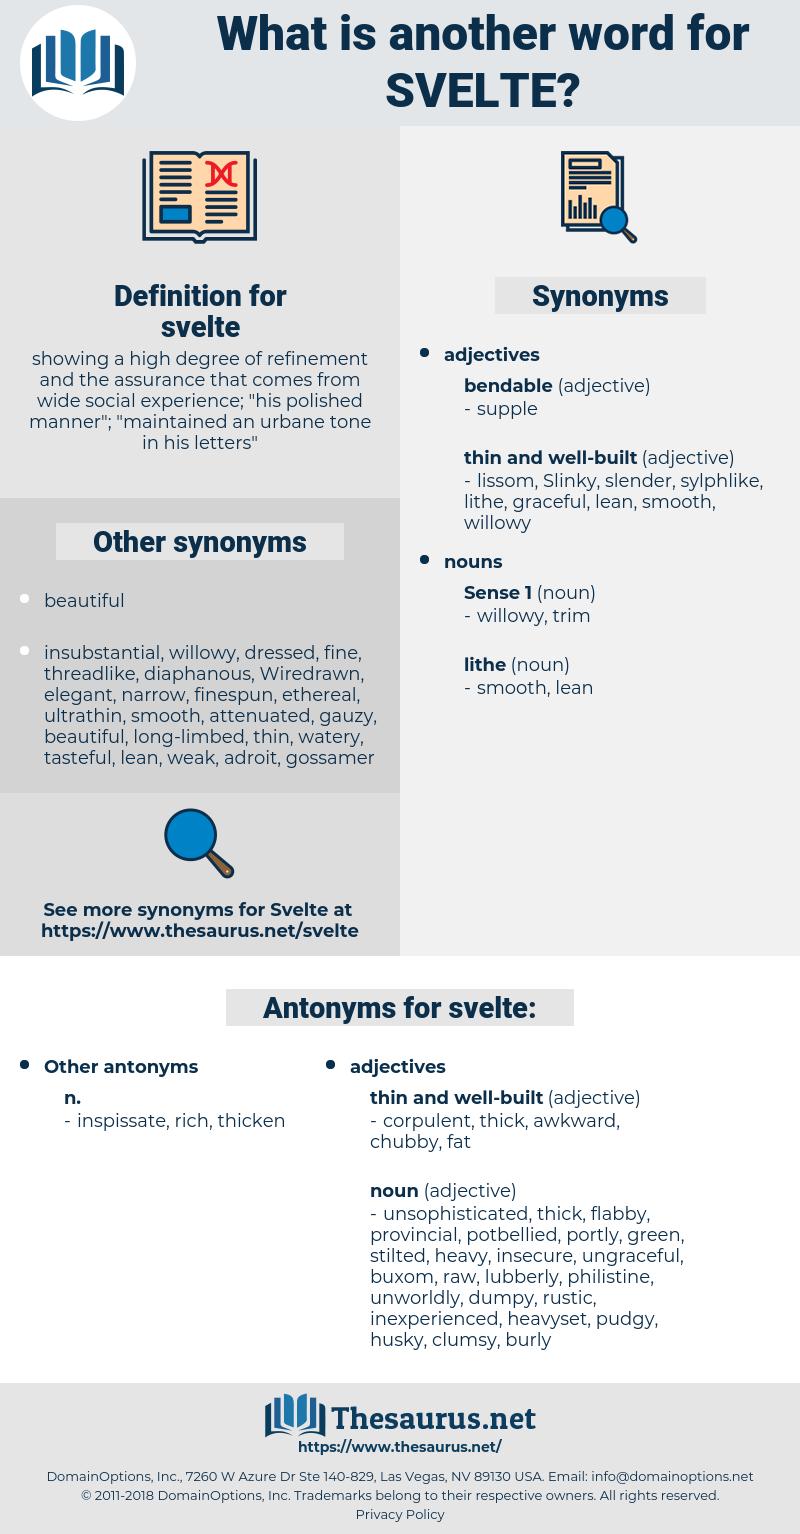 svelte, synonym svelte, another word for svelte, words like svelte, thesaurus svelte